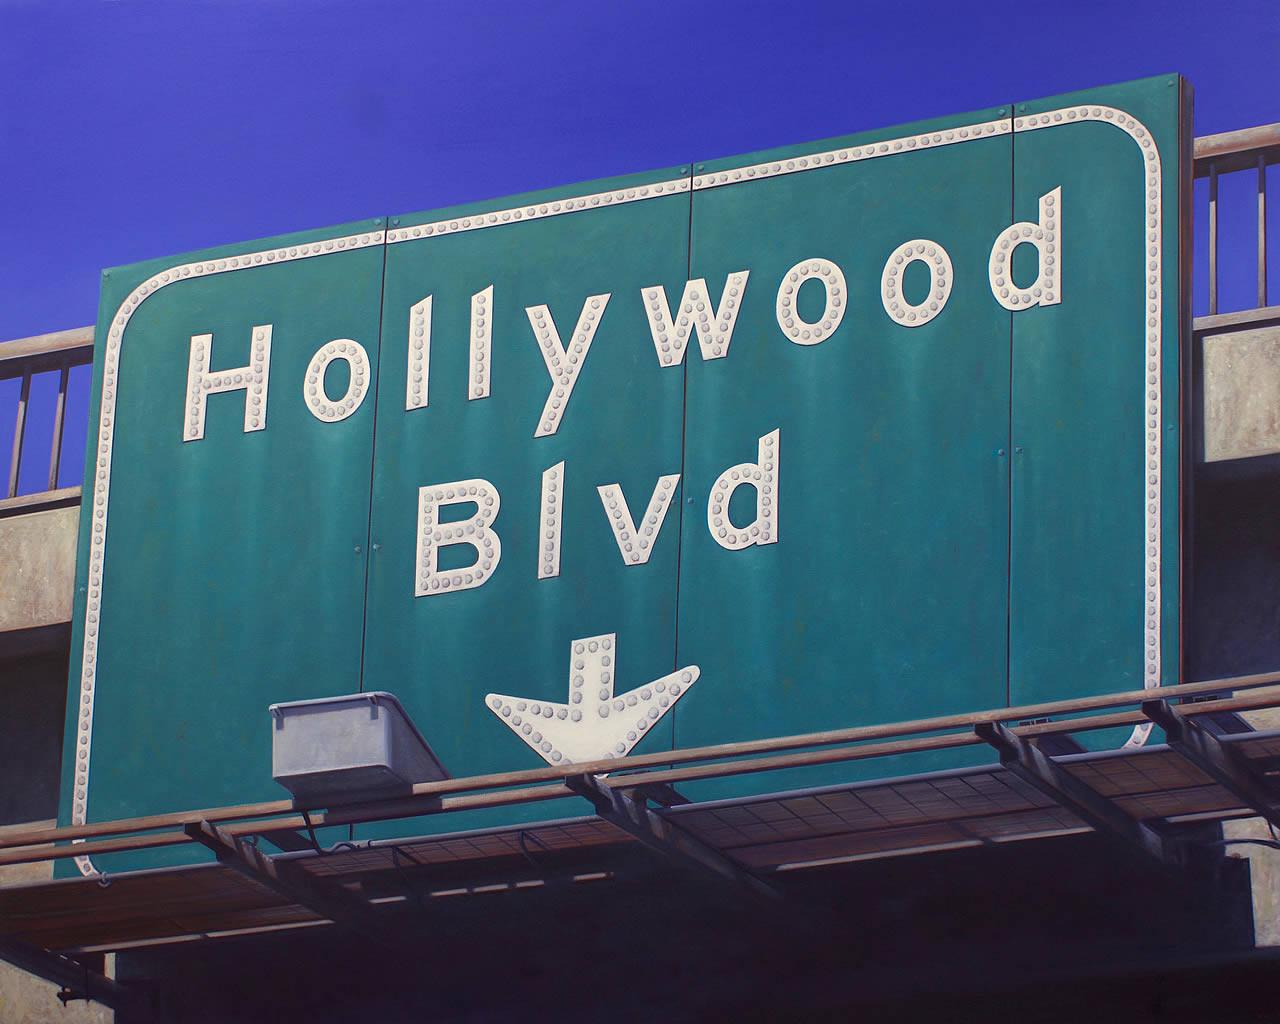 Hollywood Blvd (2019)